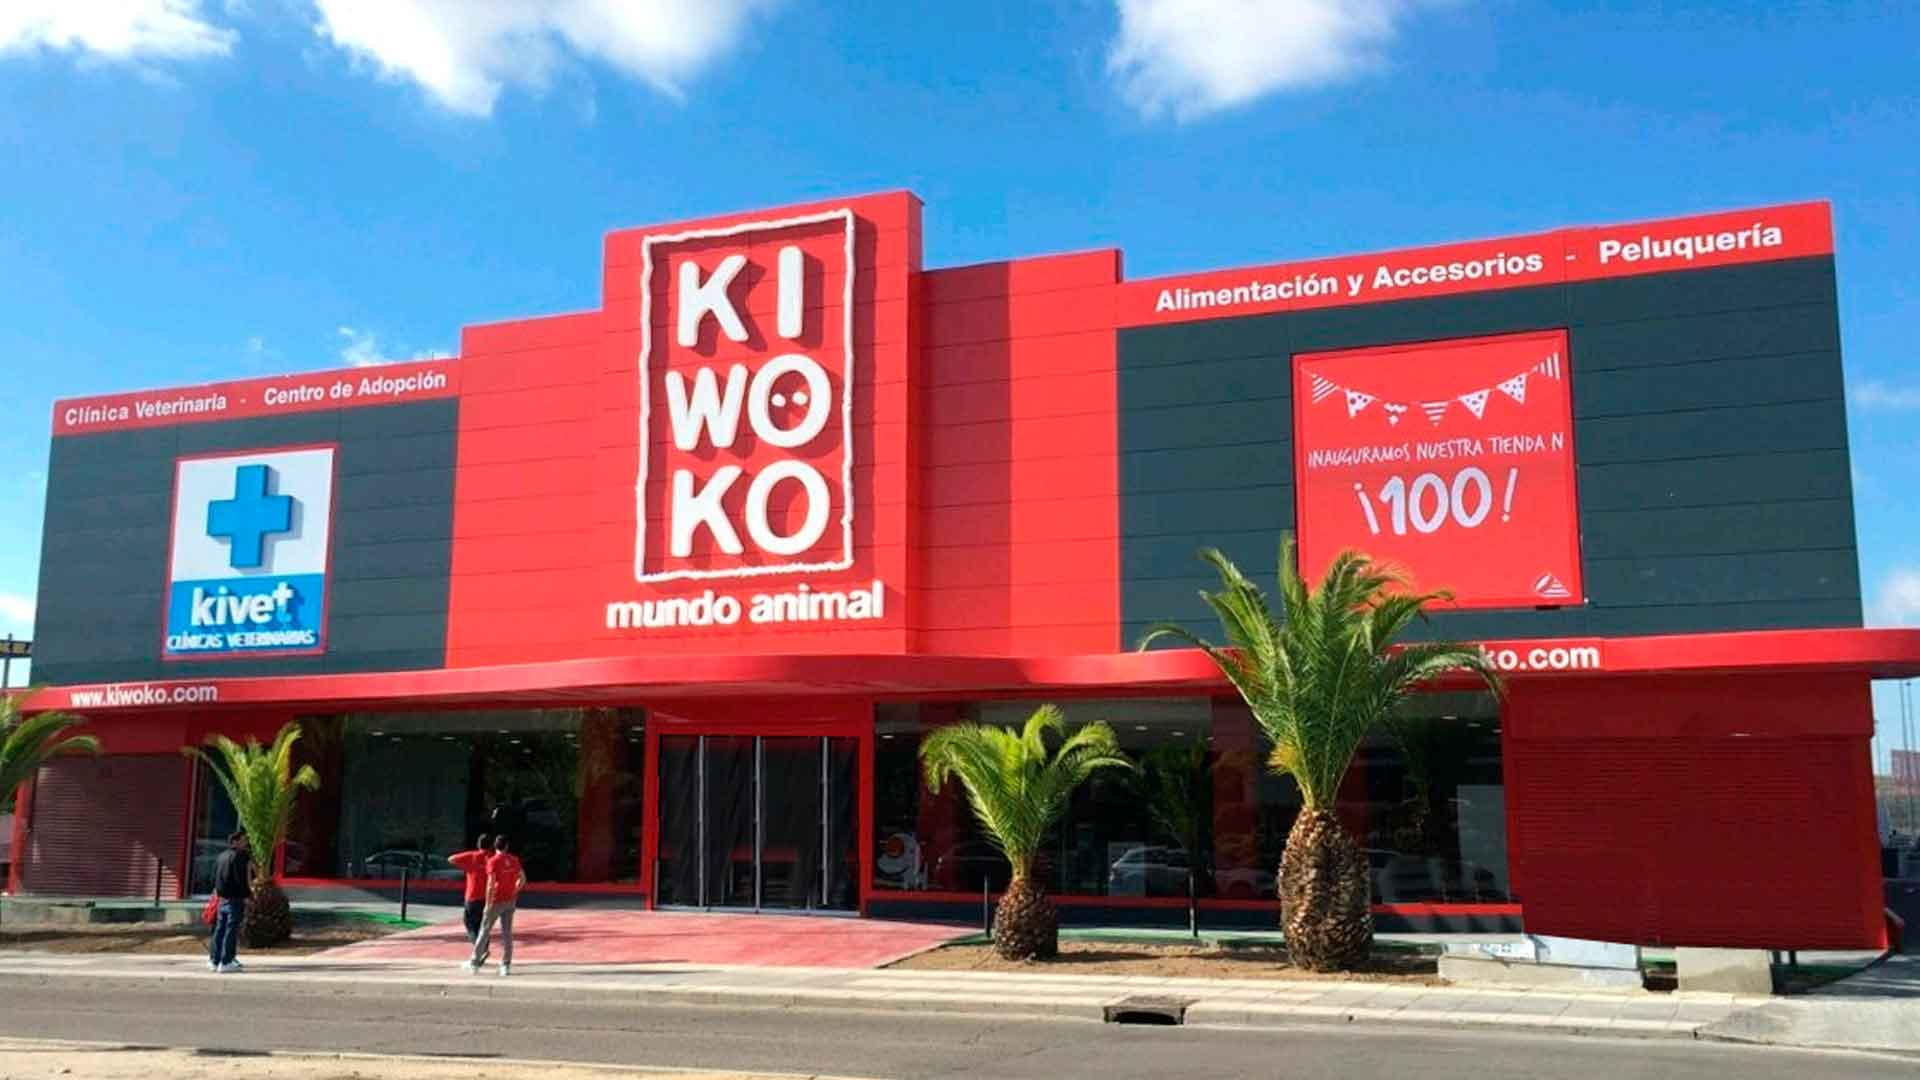 kiwoko-alcorcon